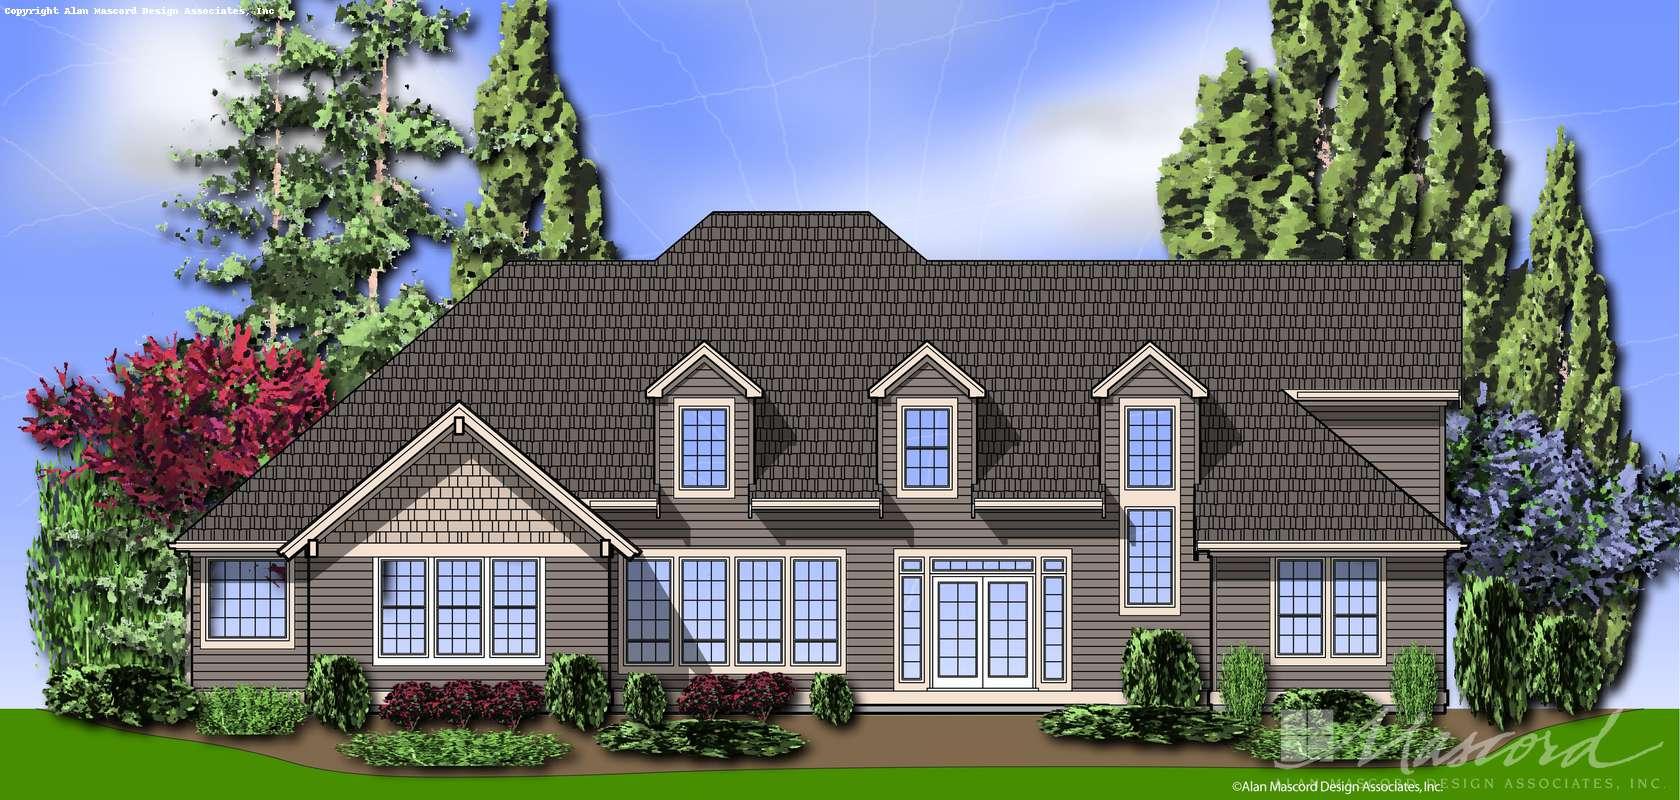 Mascord House Plan 2352B: The Amarantha